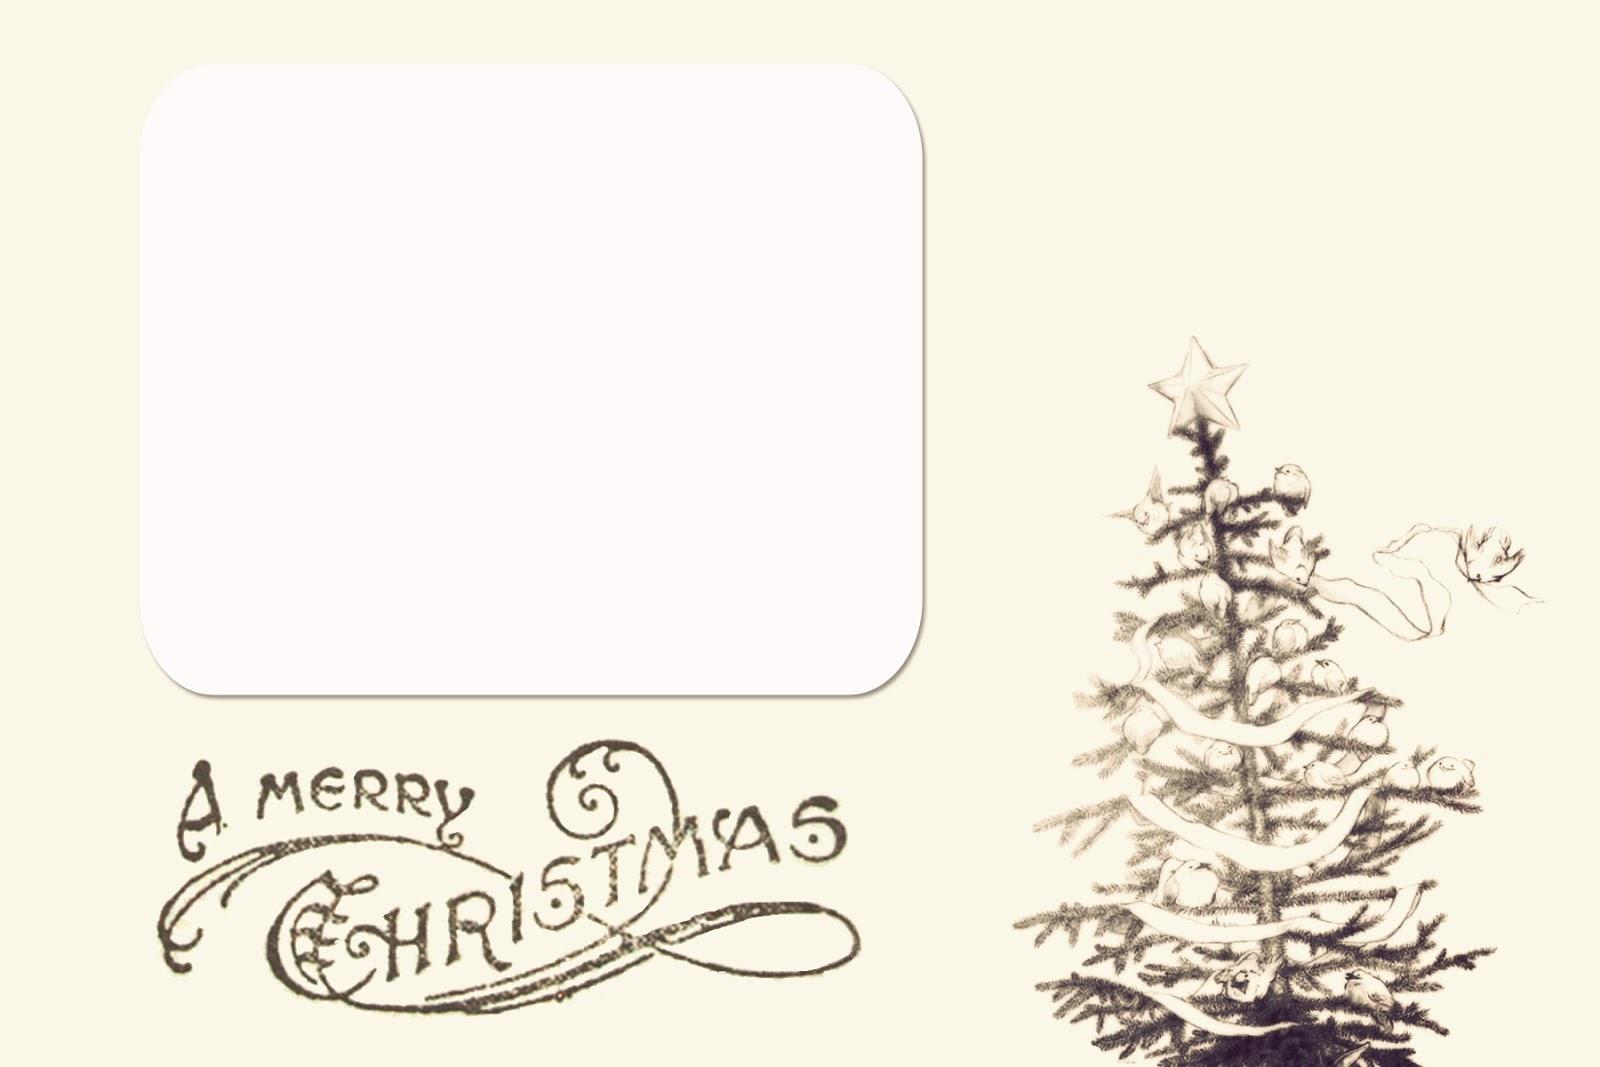 004 Free Christmas Card Templates Template Ideas Wonderful Printable - Free Online Printable Christmas Cards